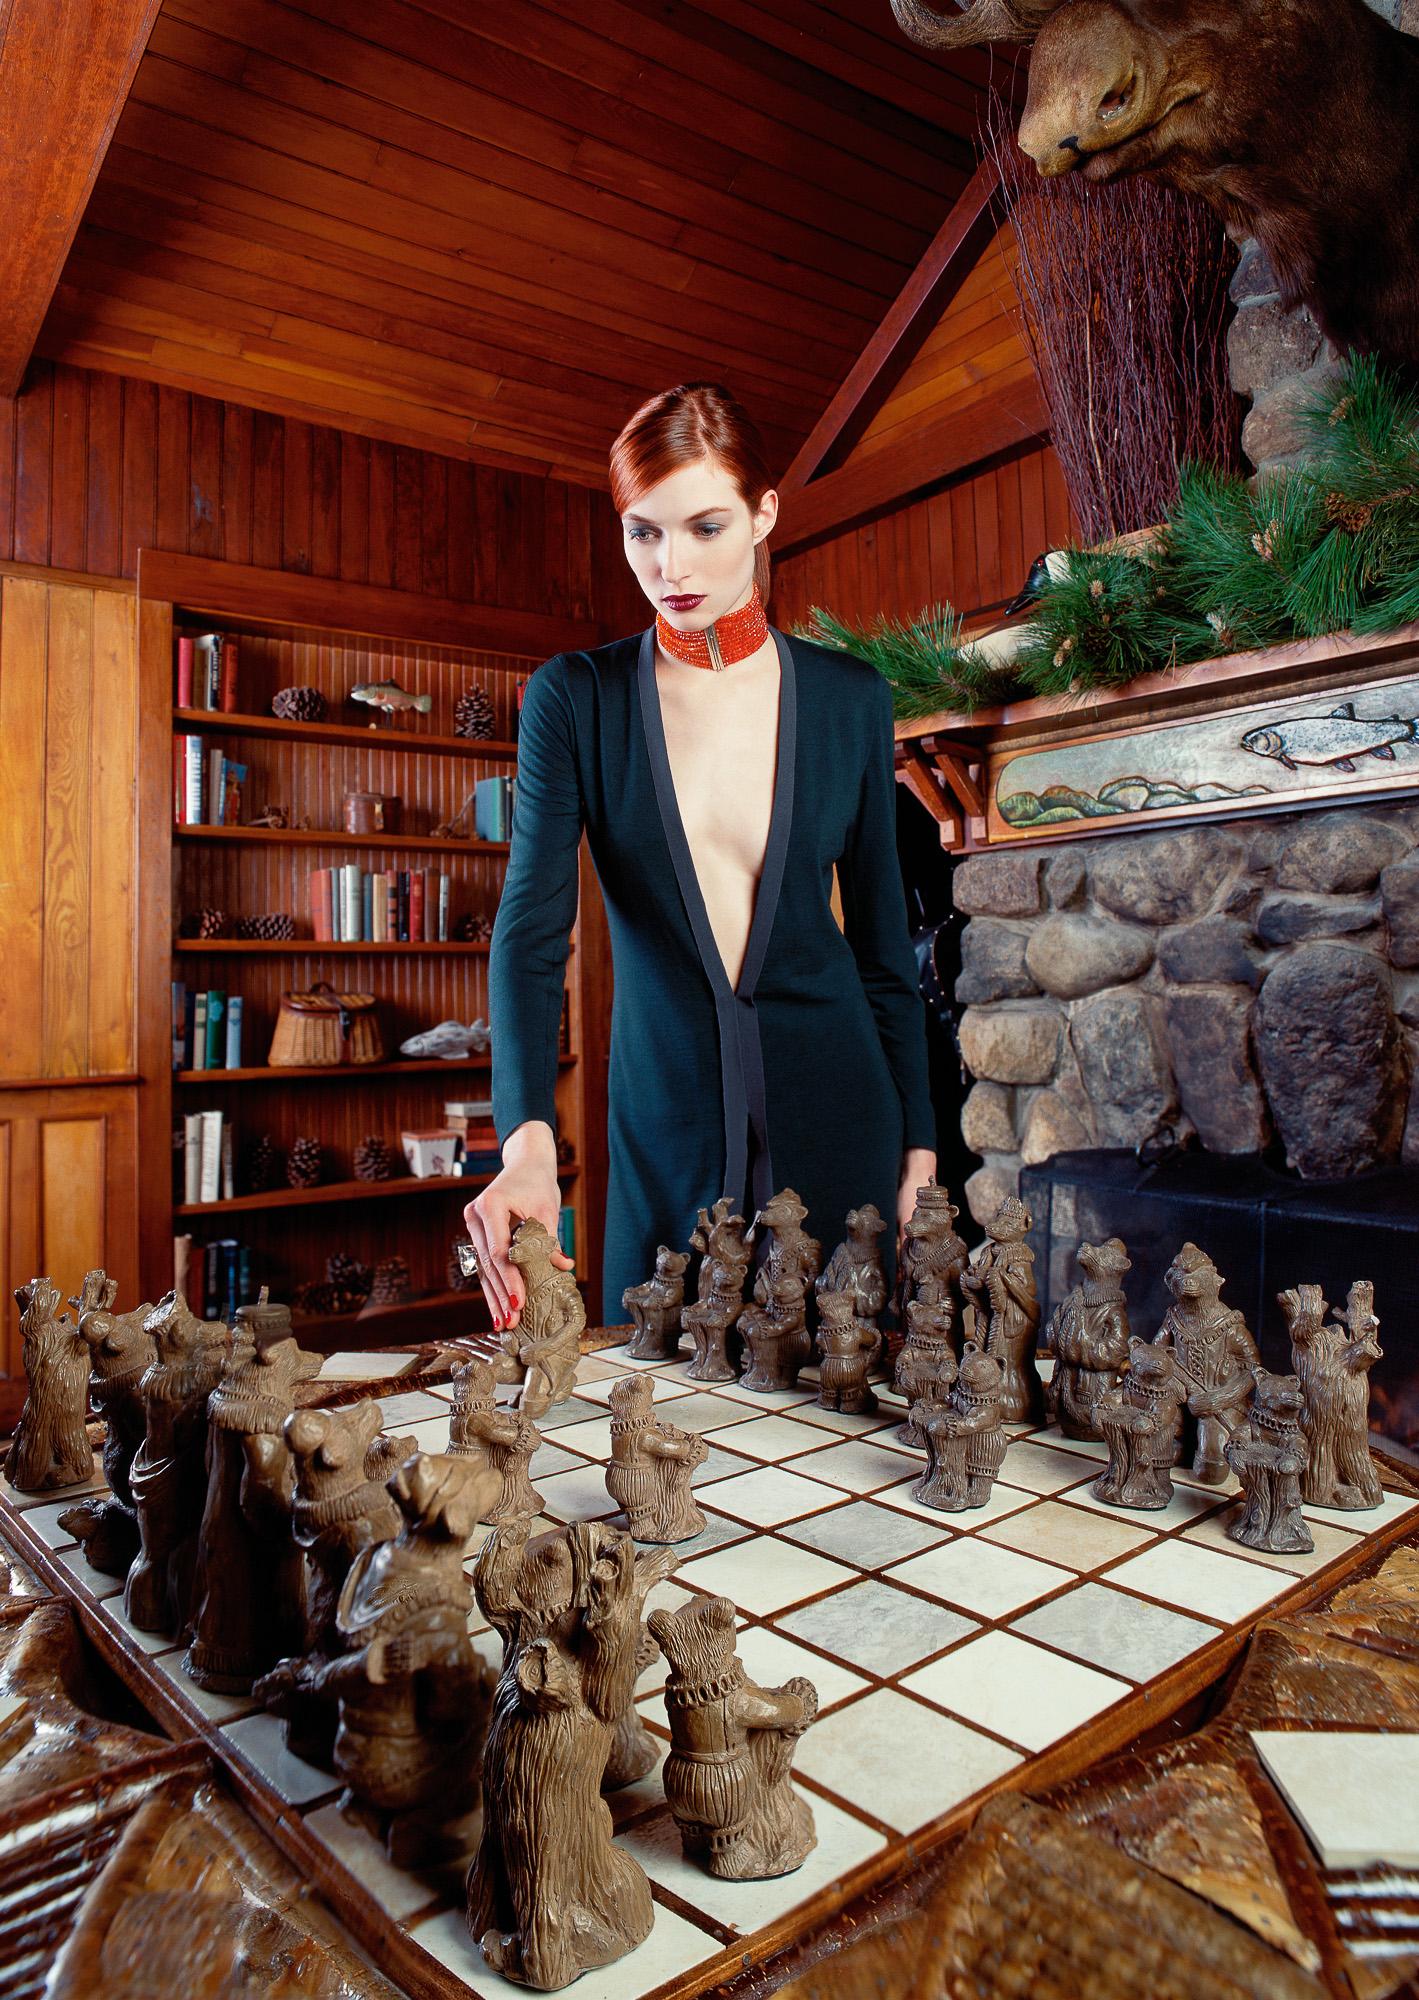 Chess_11x14_v3-SQSPC_2000px-sharpHIGH-2.jpg